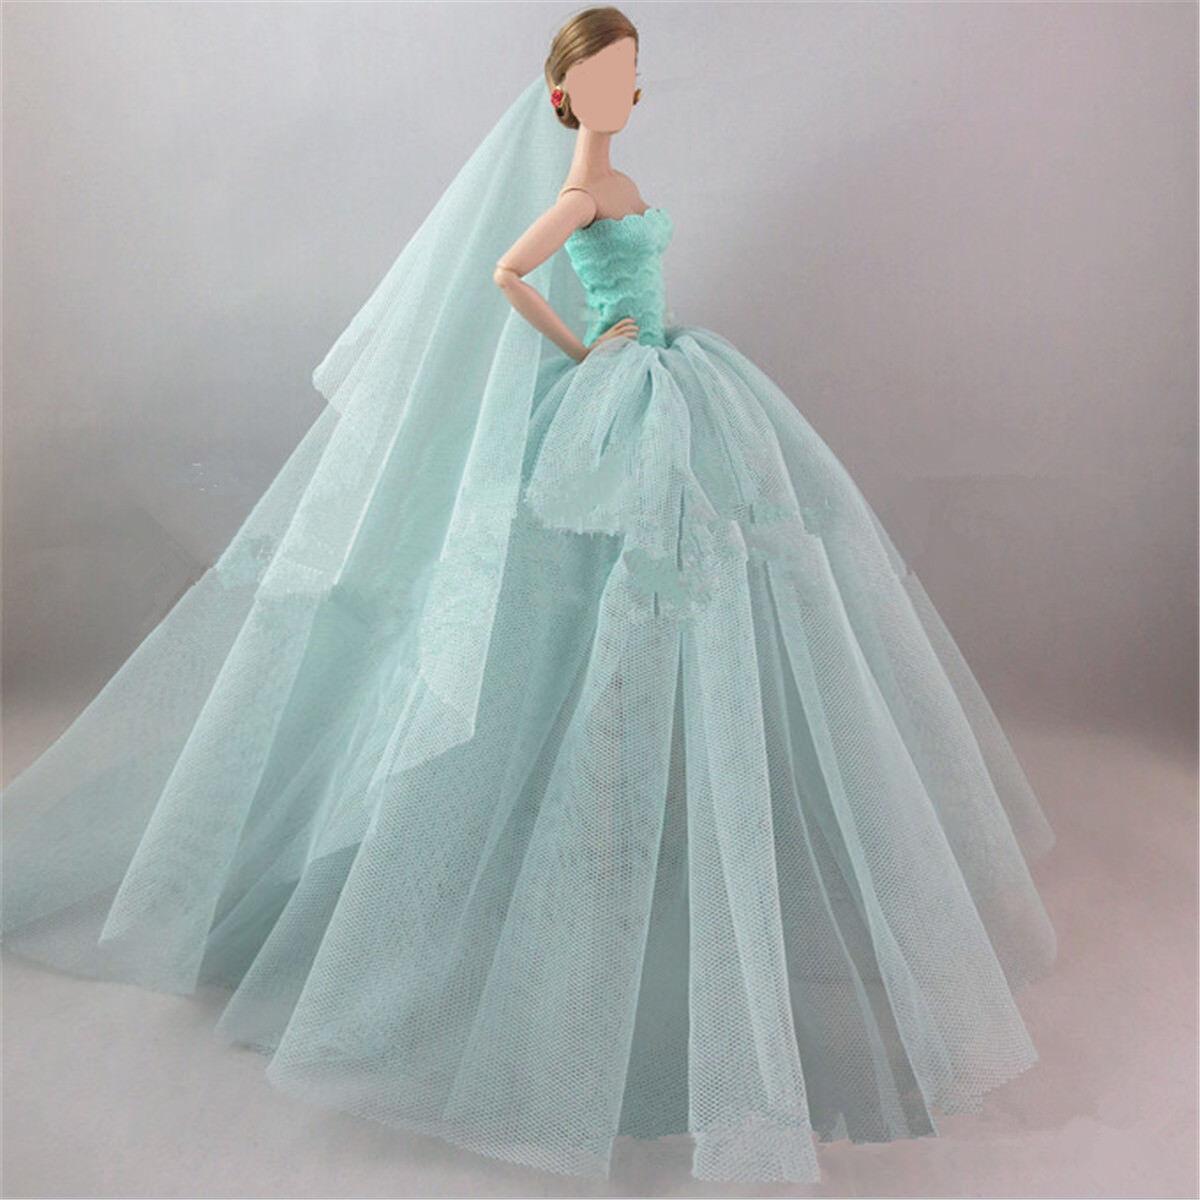 Handmade Wedding Royalty Princess Long Dress/clothes/gown Veil for ...